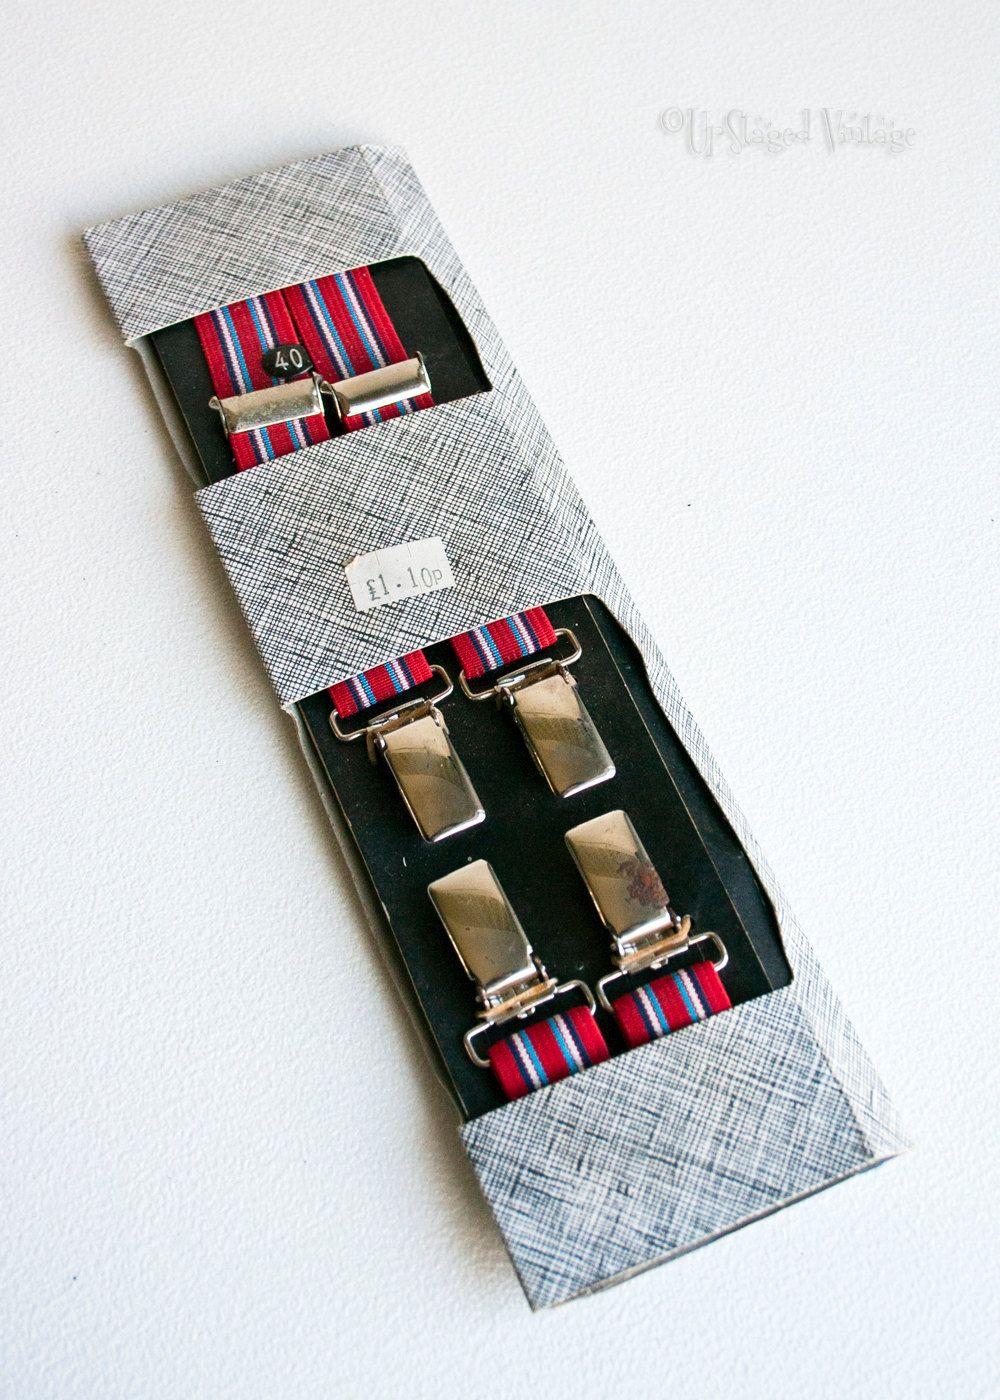 Burgundy Paisley Red Clip On Trouser Braces Elastic Suspenders Handmade in UK